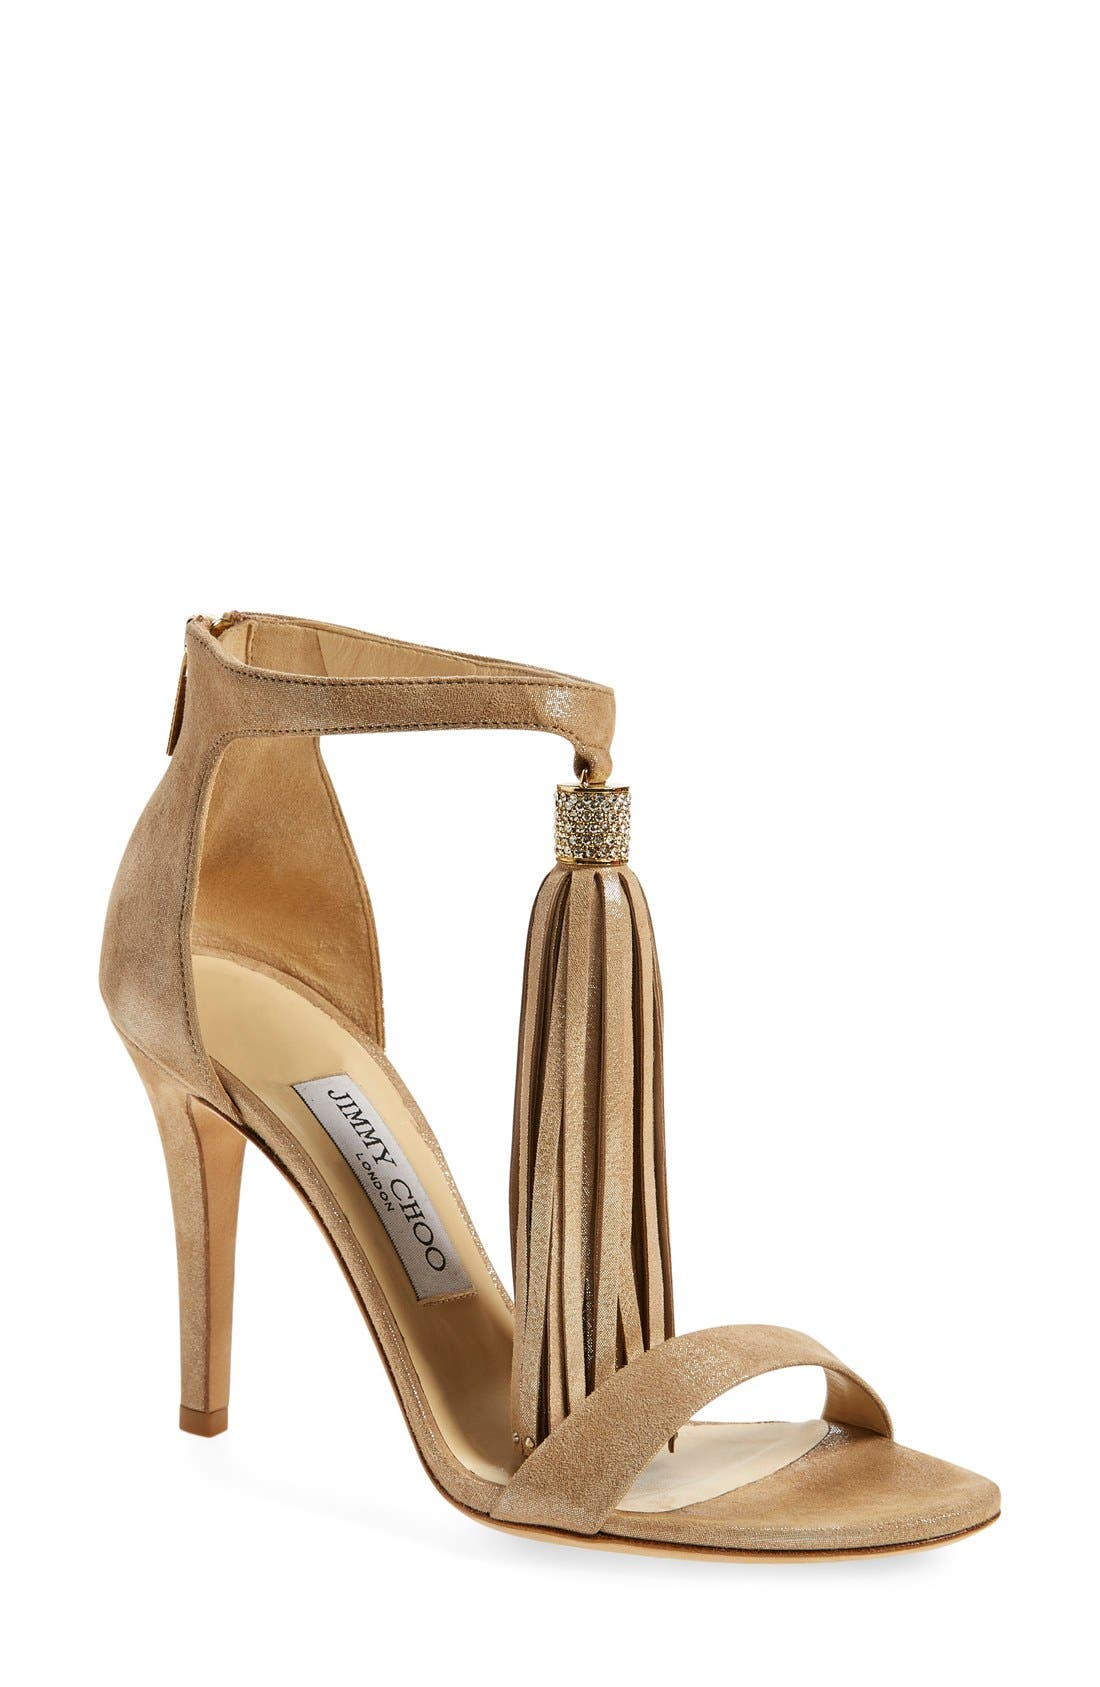 Alternate Image 1 Selected - Jimmy Choo 'Viola' Ankle Strap Sandal (Women)